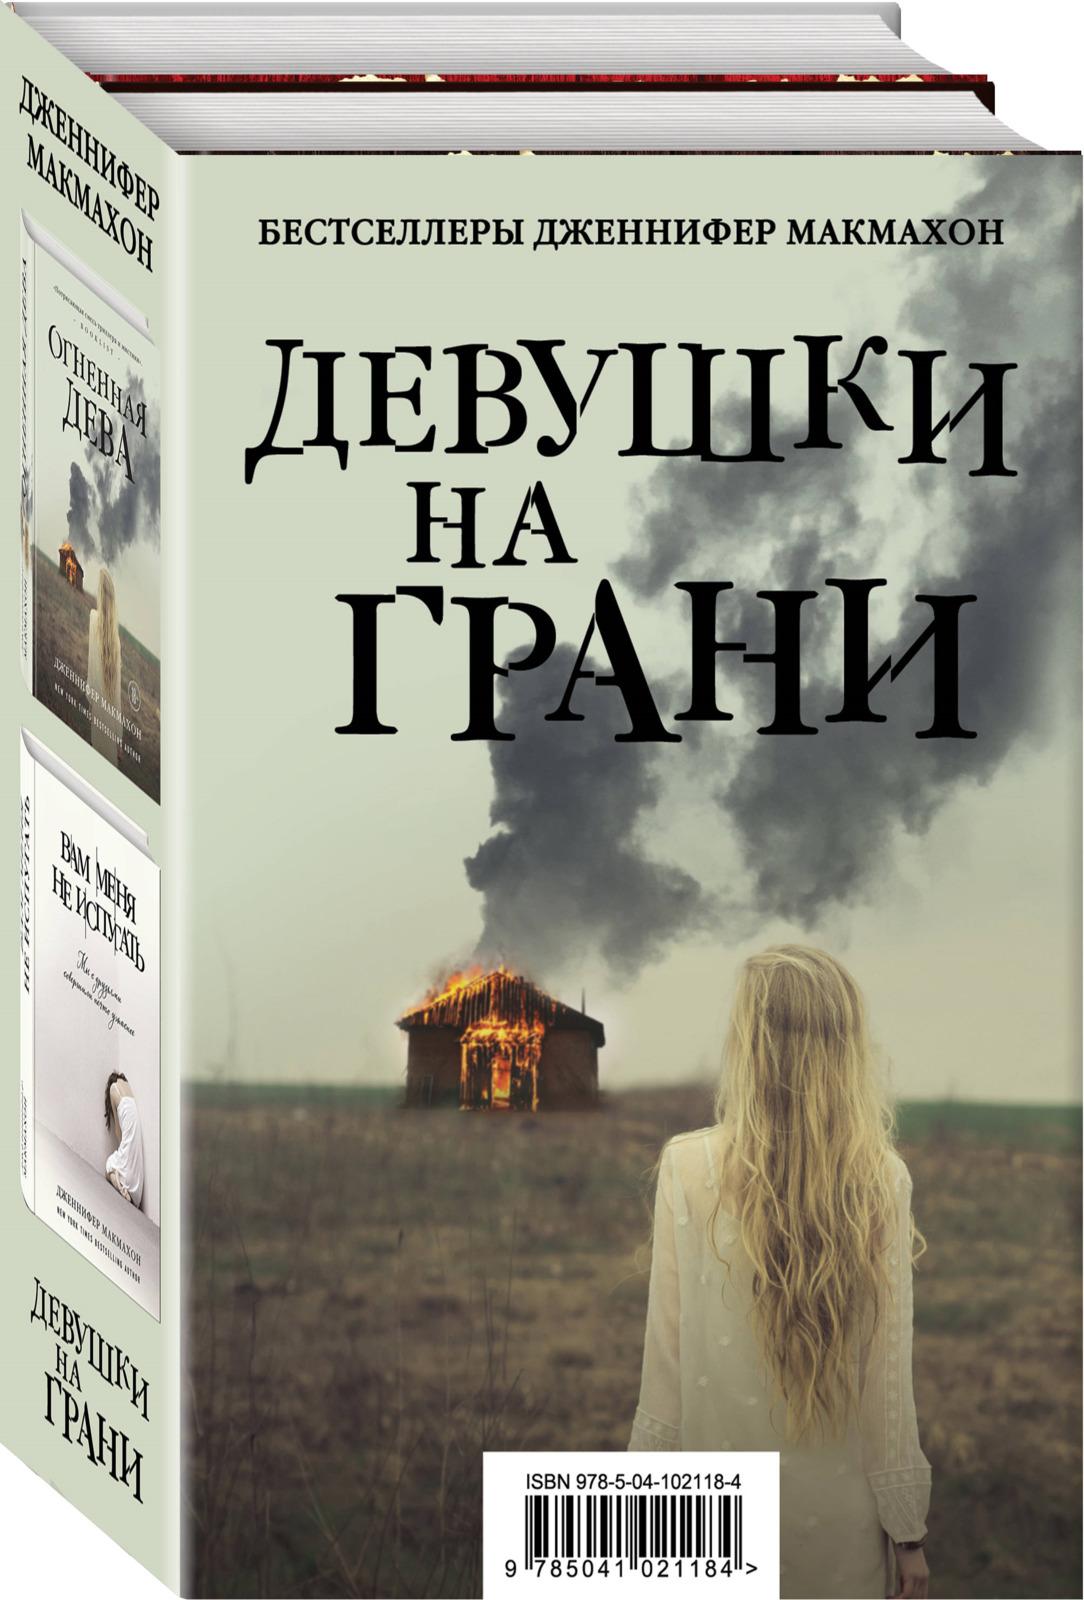 Дженнифер Макмахон Девушки на грани (комплект из 2 книг)